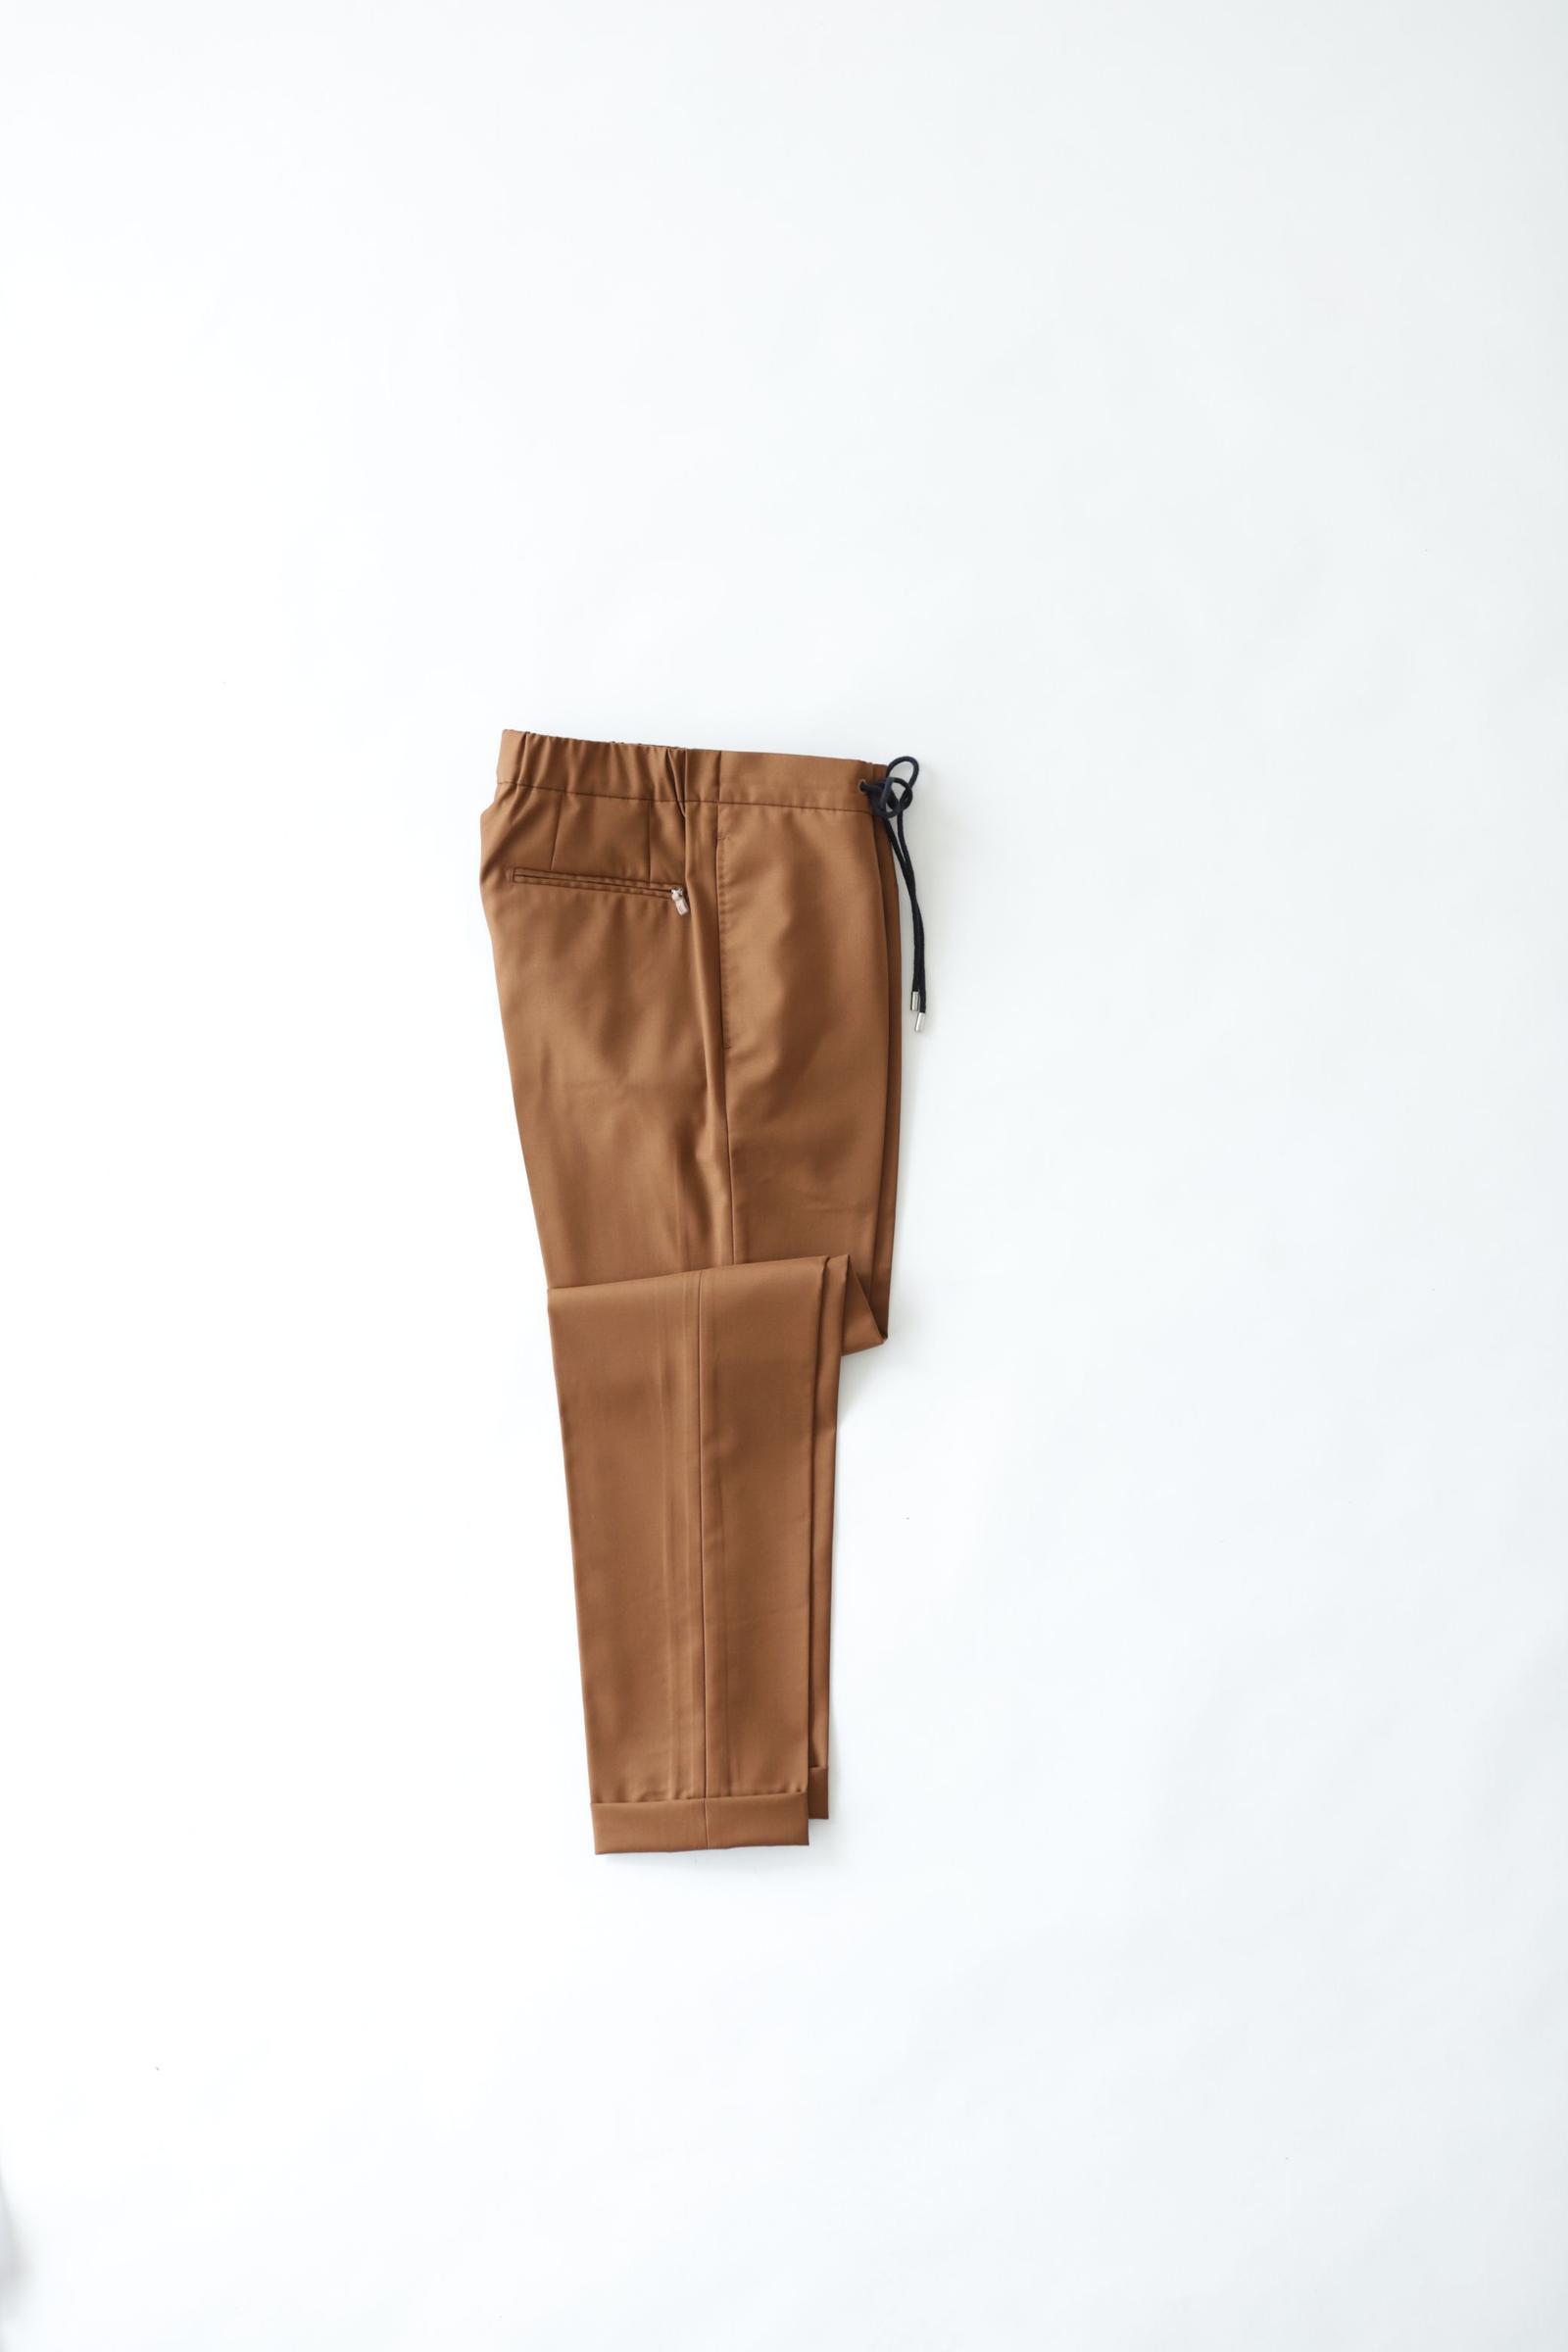 Walkman Trouser - Caramel